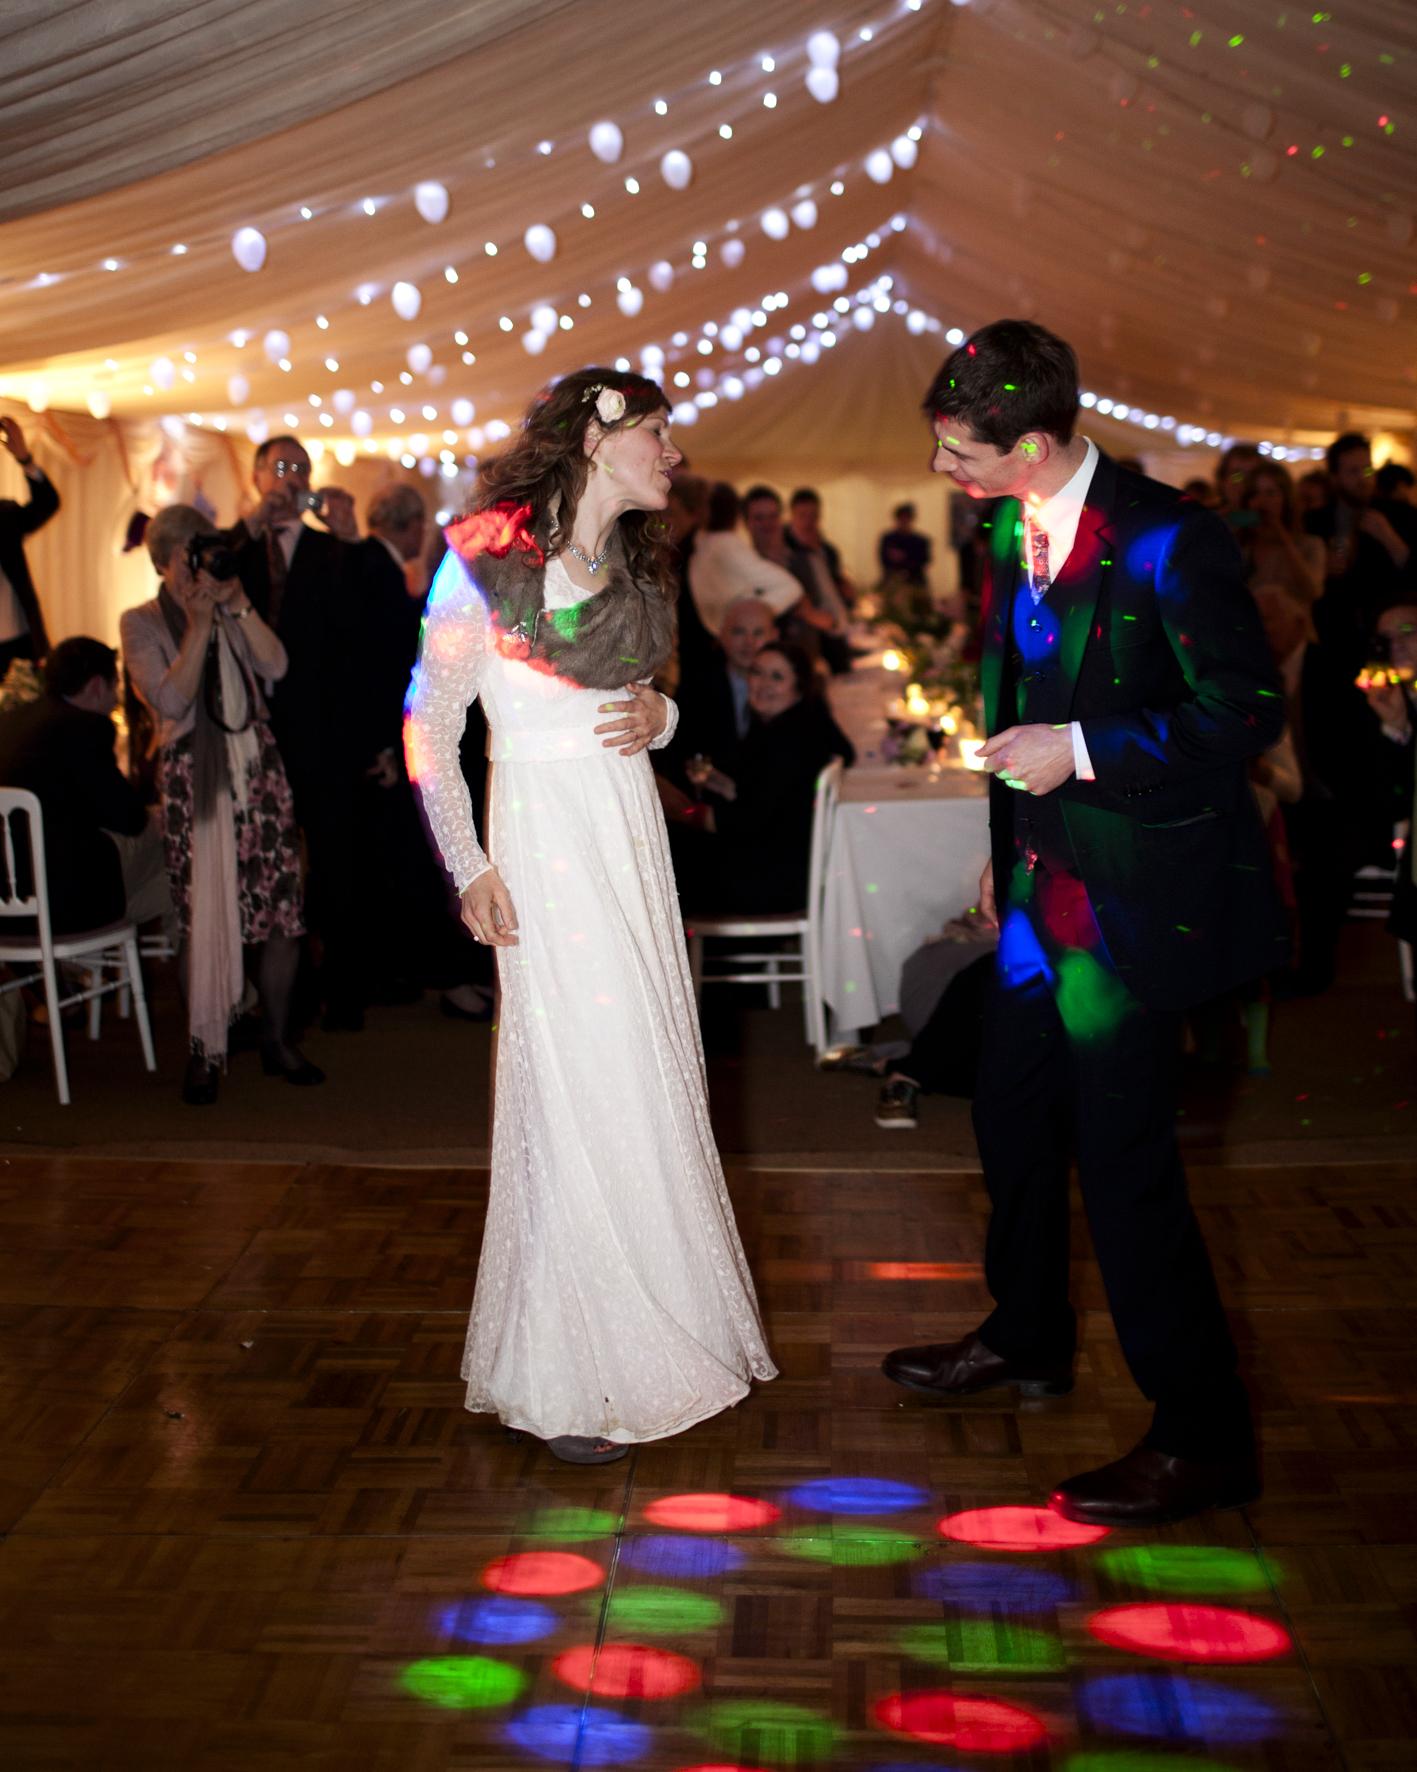 Wedding example_M&P__MG_4407-Edit_Claudia Leisinger.jpg